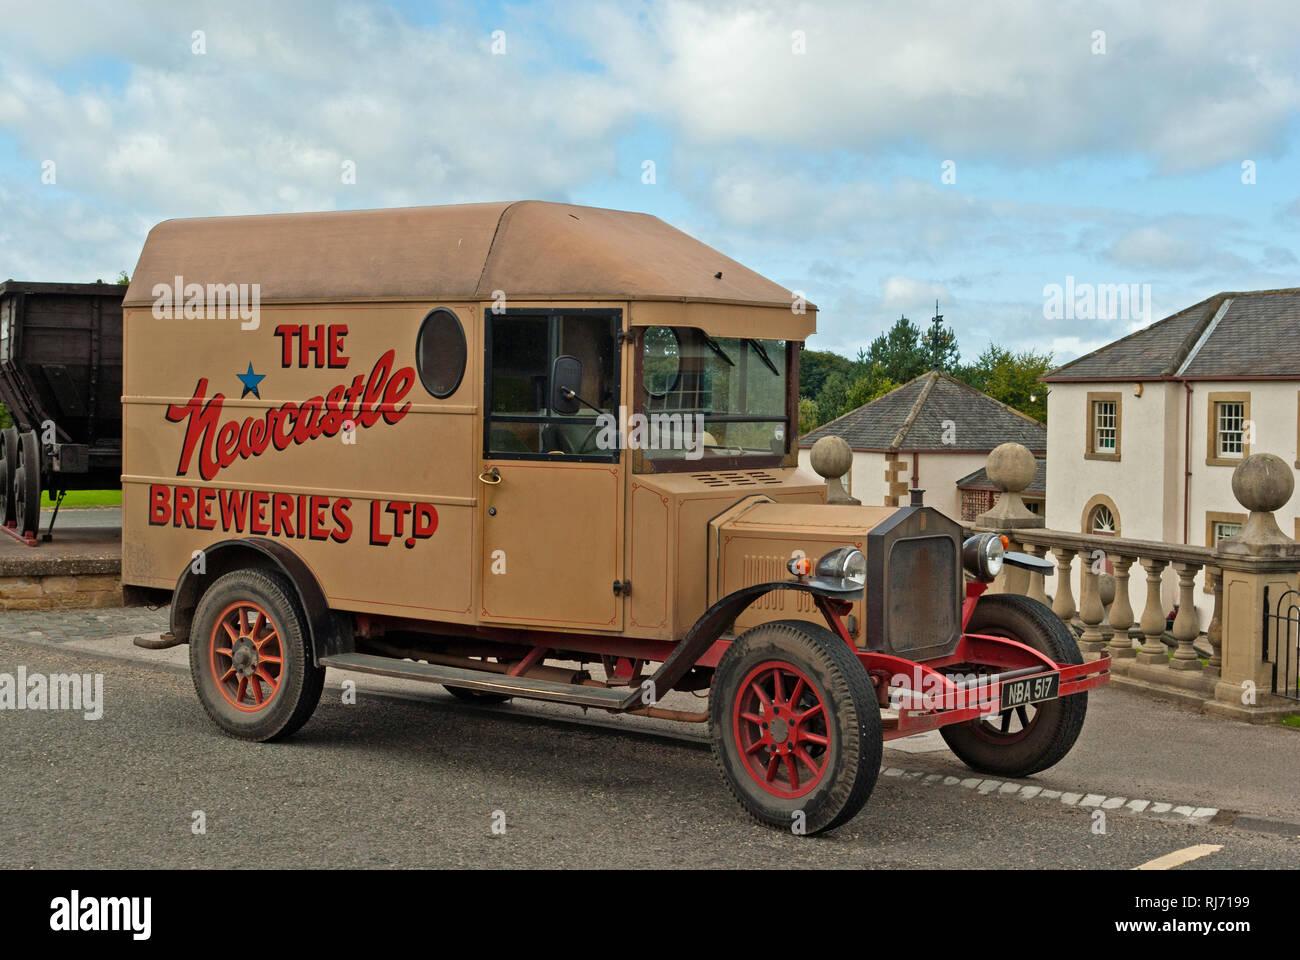 Vintage Newcastle Breweries delivery van, Beamish Museum, County Durham, UK - Stock Image